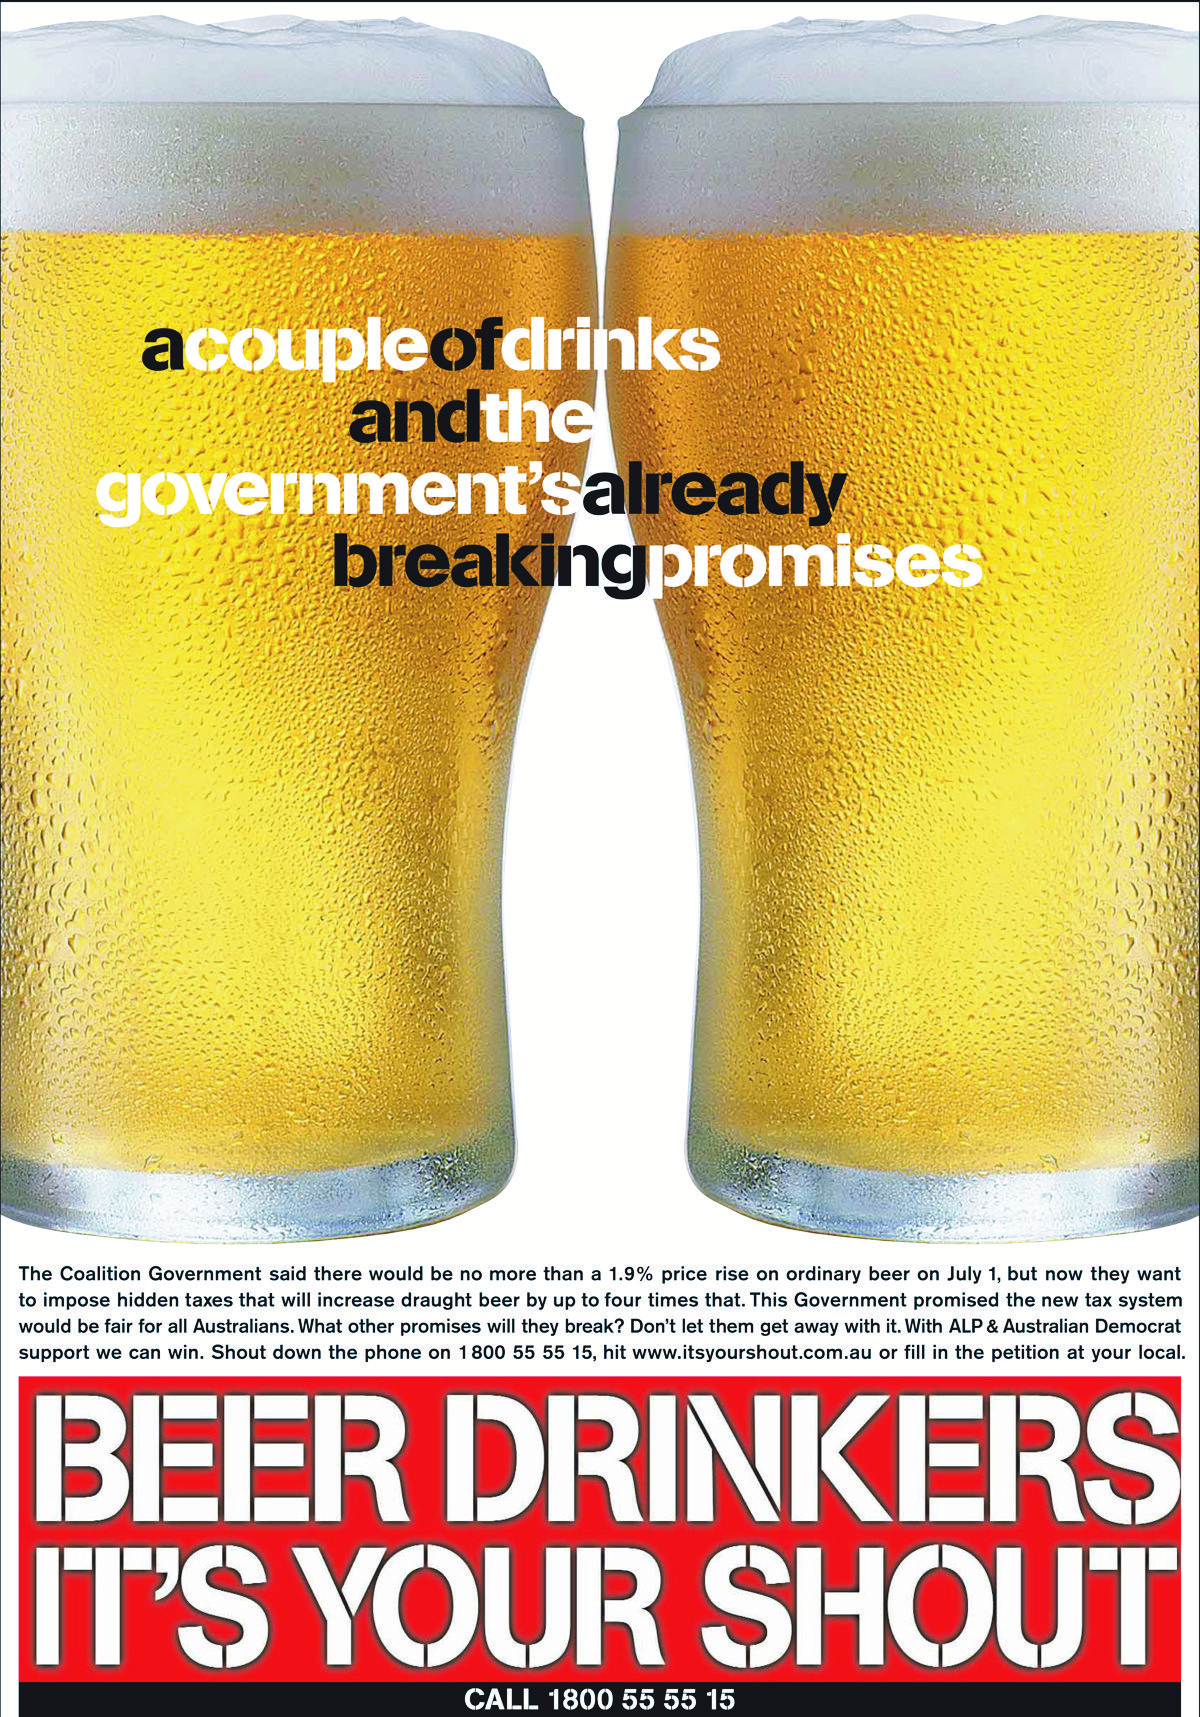 Aussie Beer - Couple